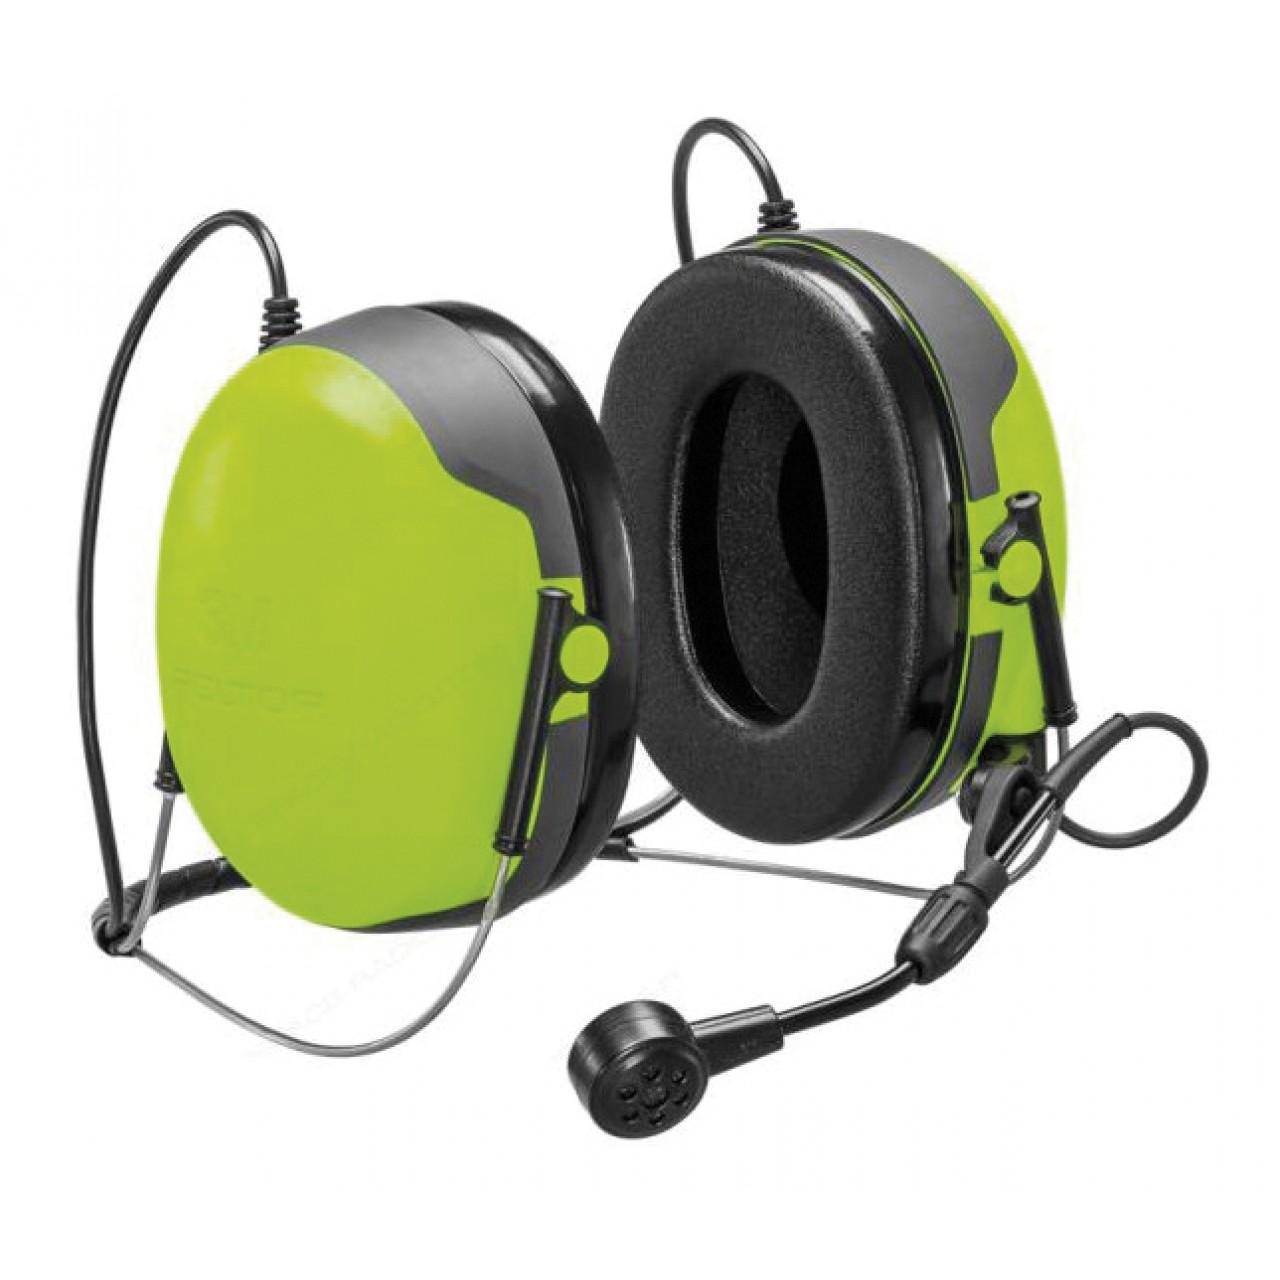 HS-PEPASN-FLEX Headsets and earphones - ICOM